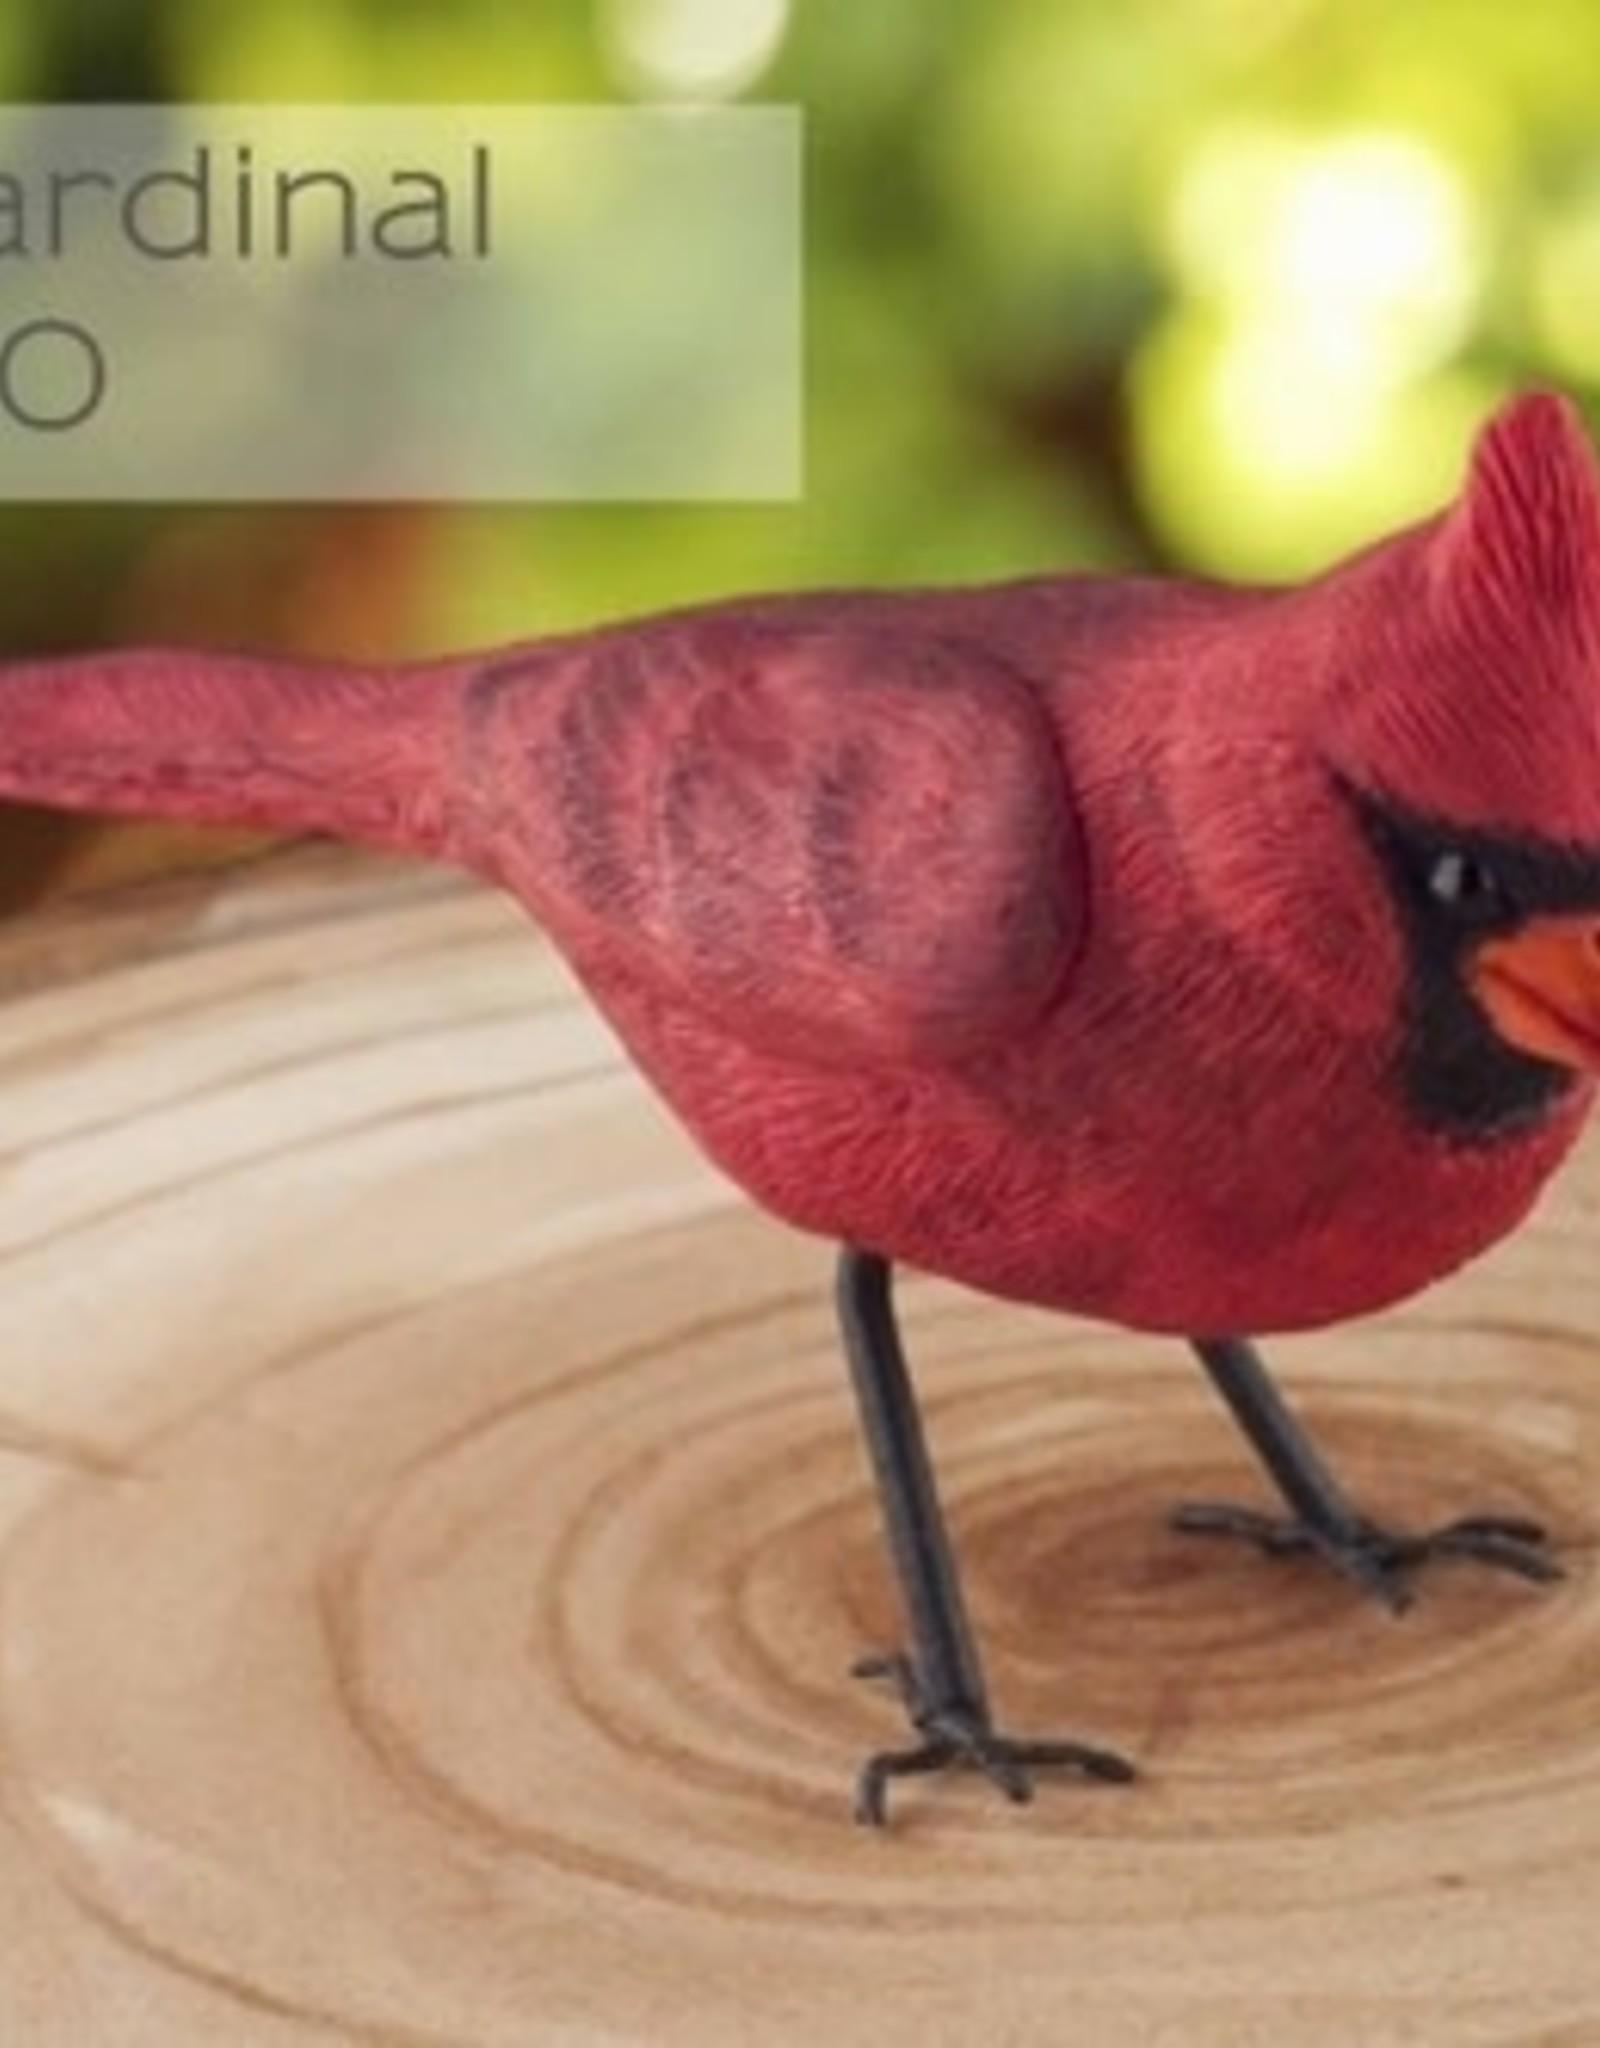 FPC FPC Red Cardinal/Levensechte vogelmal